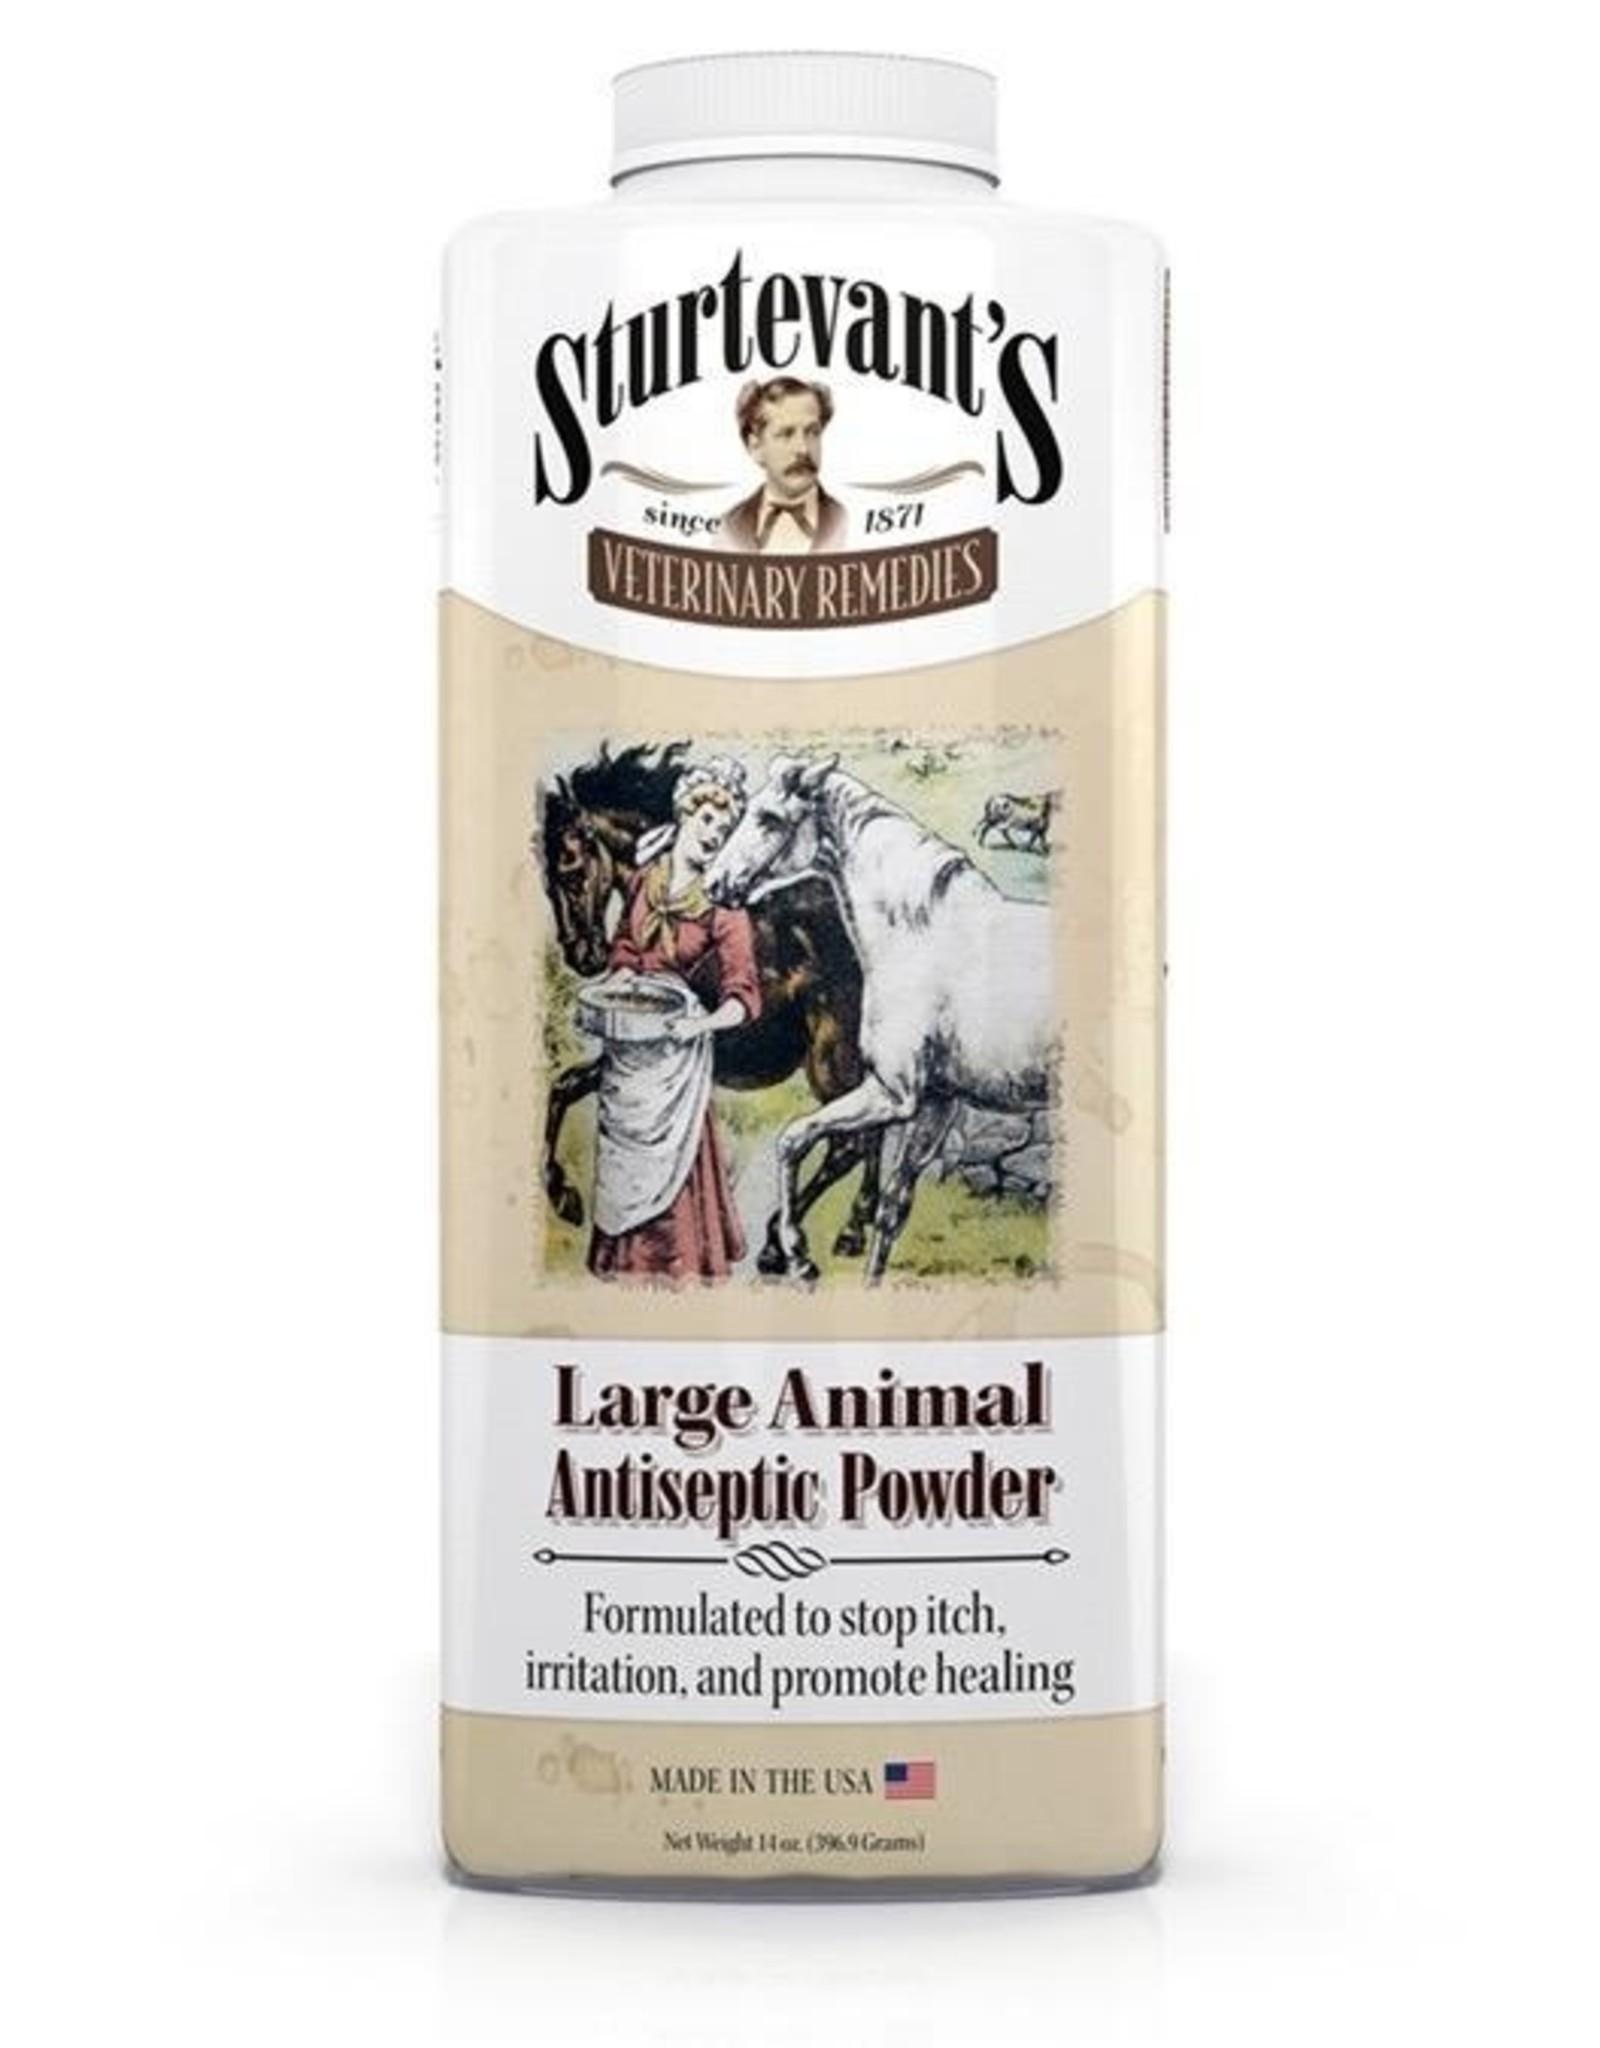 Sturtevant Sturtevant's Veterinary Antiseptic Powder - 14oz